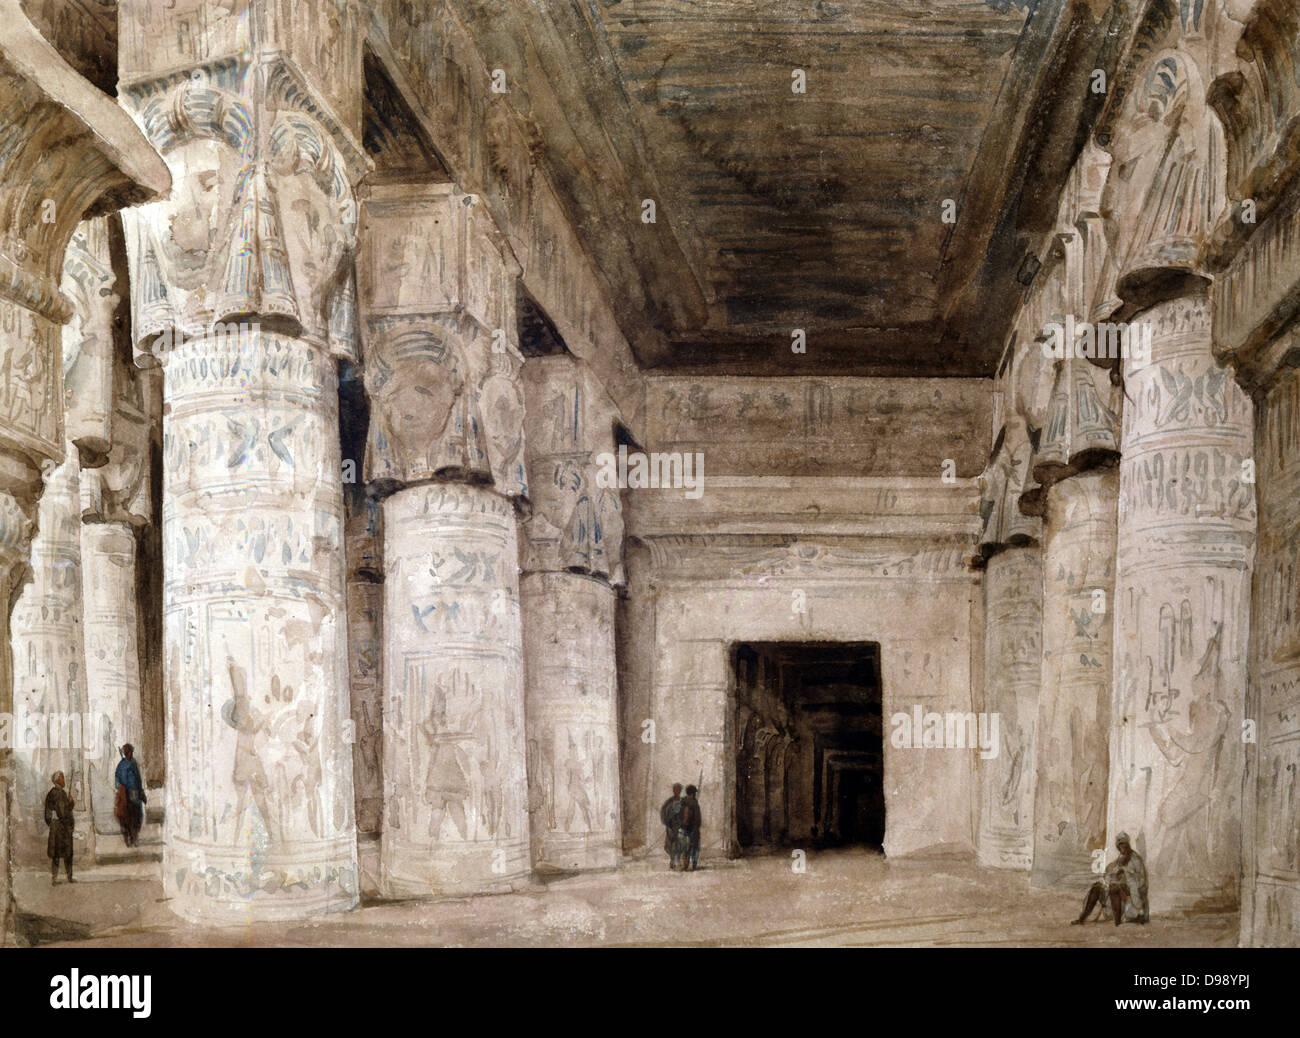 French Architect dendera interior'. hector horeau (1801-1782) french architect